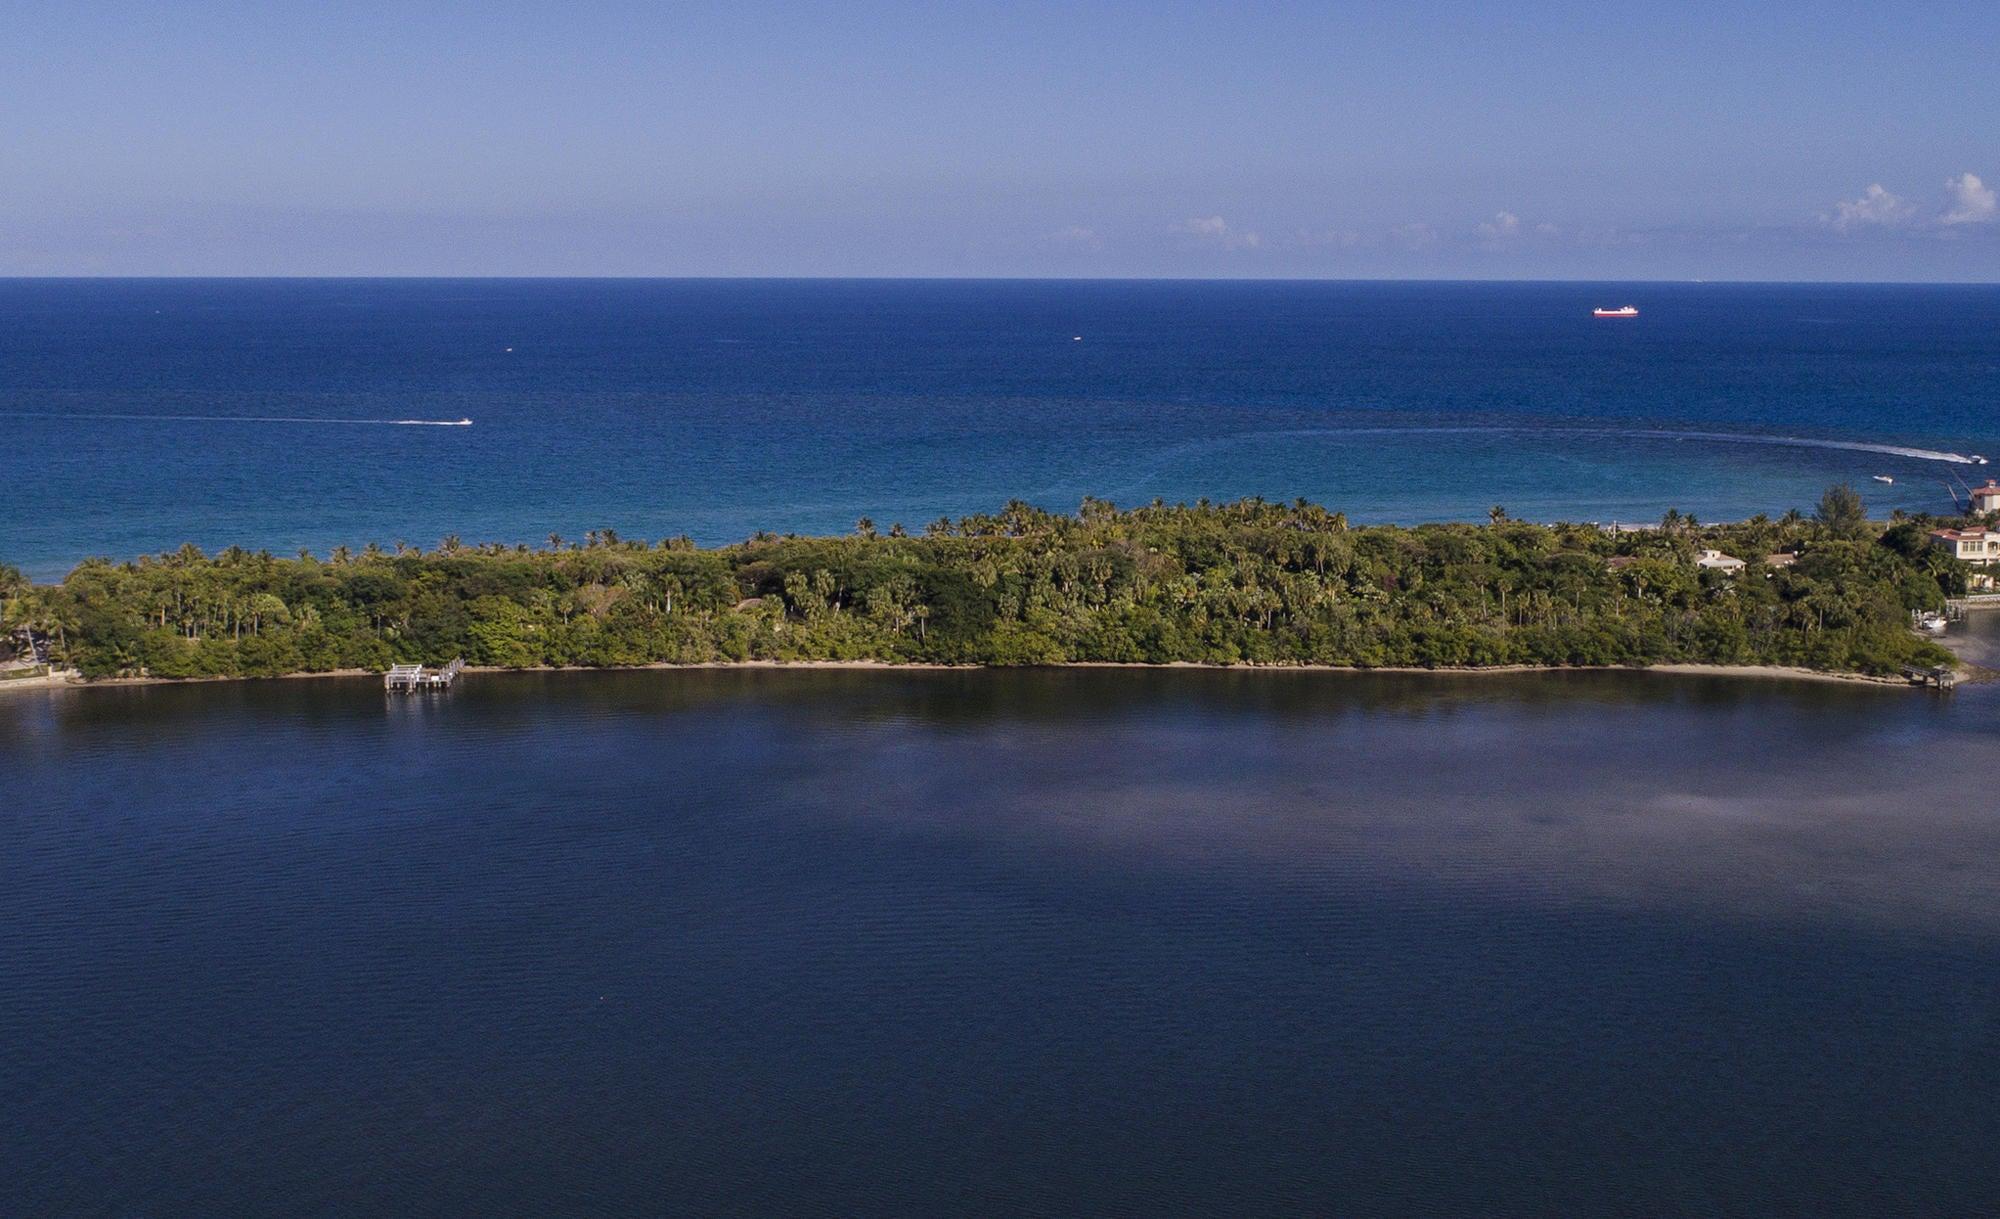 2000 S Ocean Boulevard Manalapan, FL 33462 - MLS #: RX-10335802